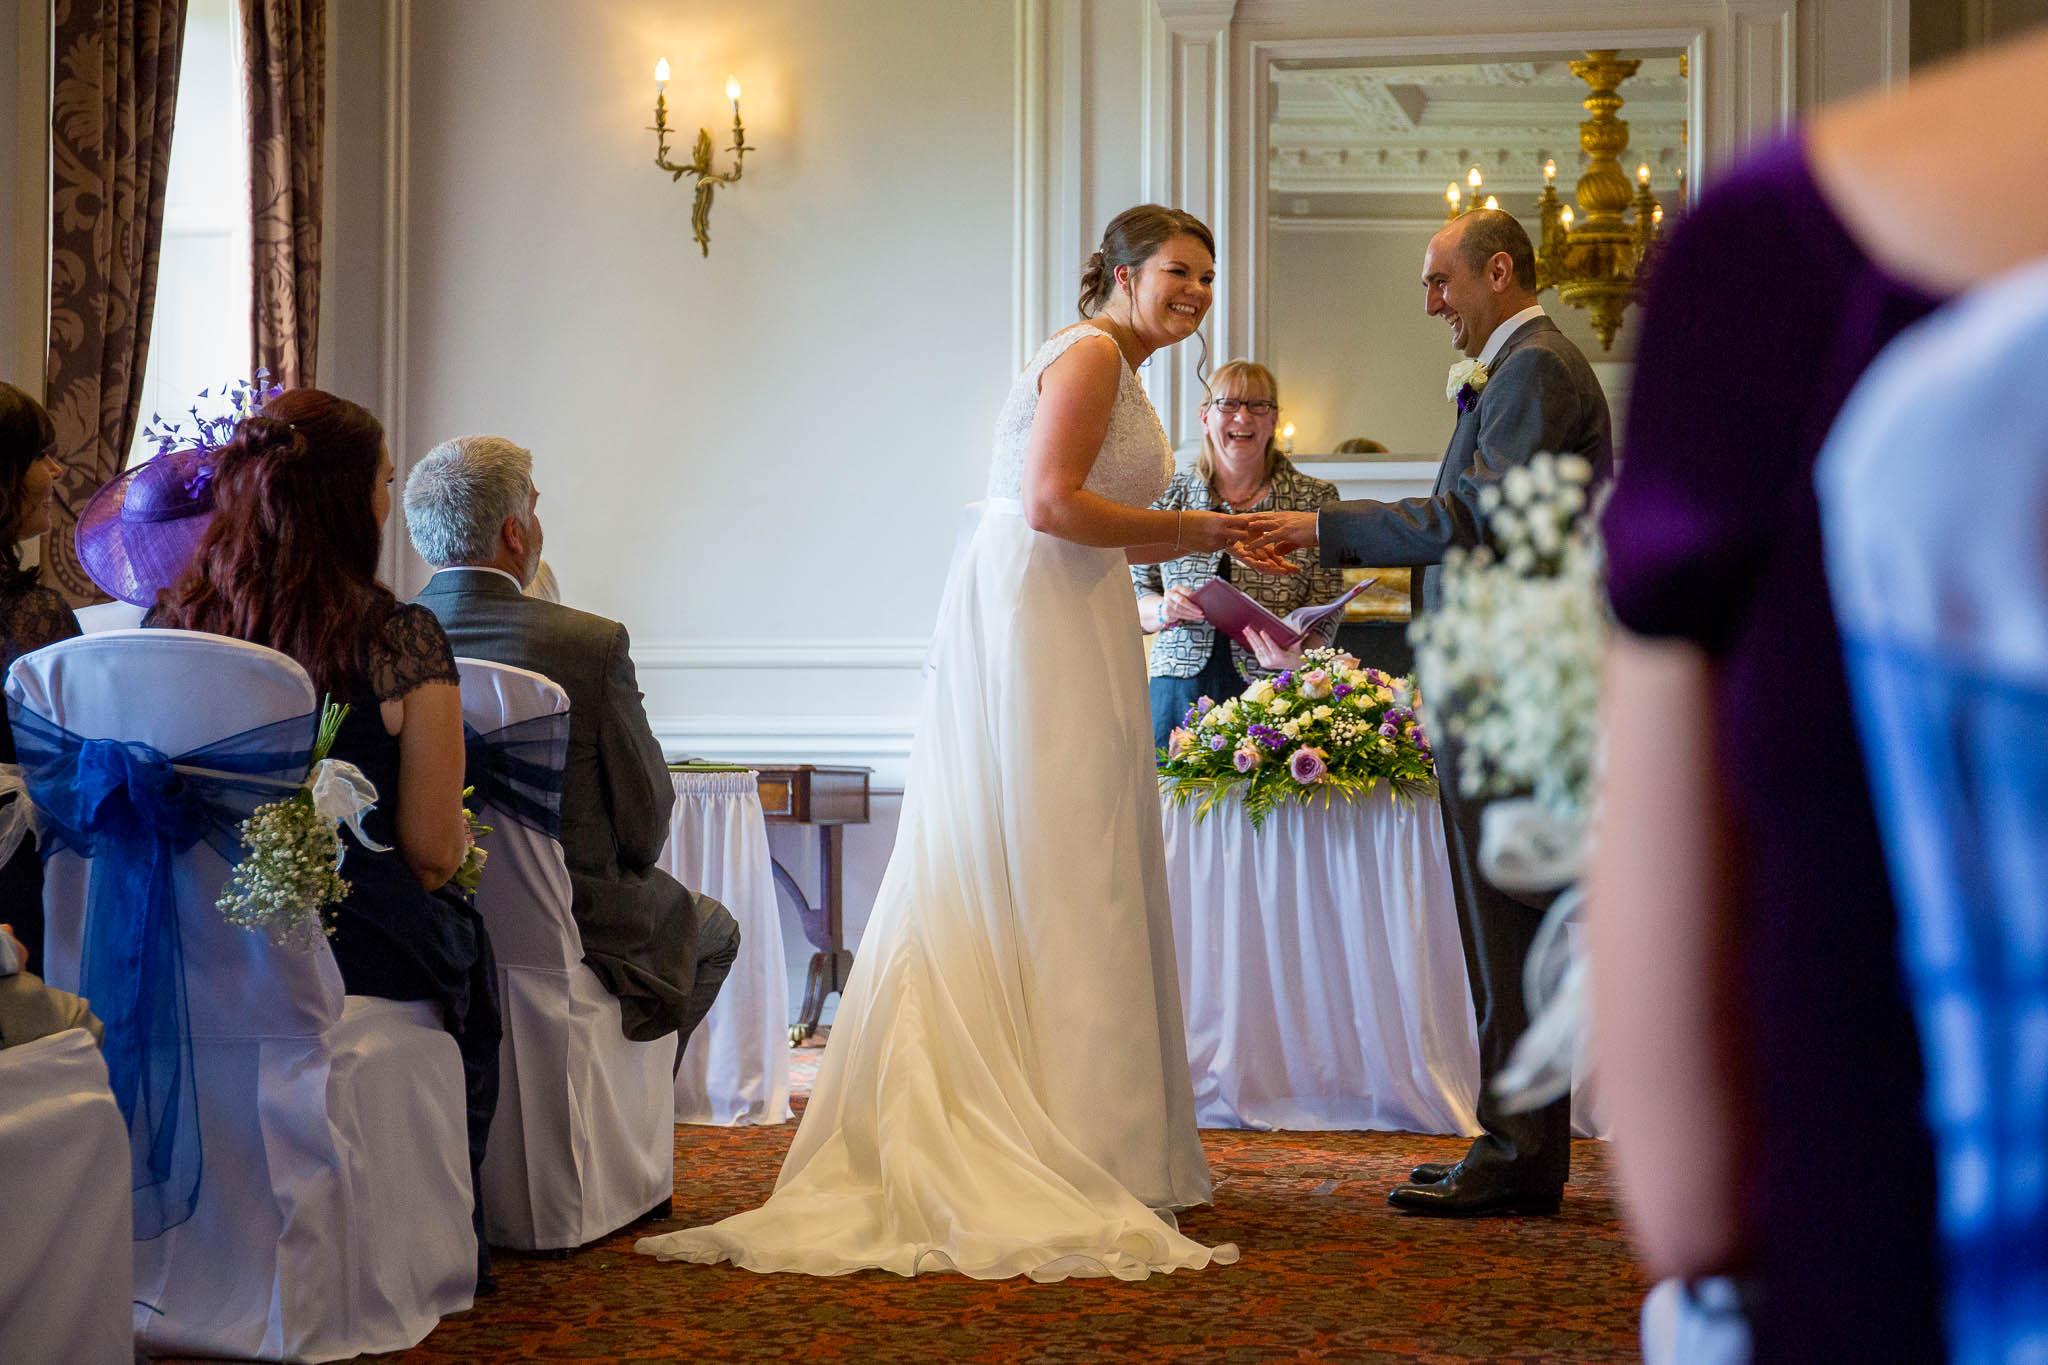 Crathorne Hall Hotel Wedding Photographer55.jpg